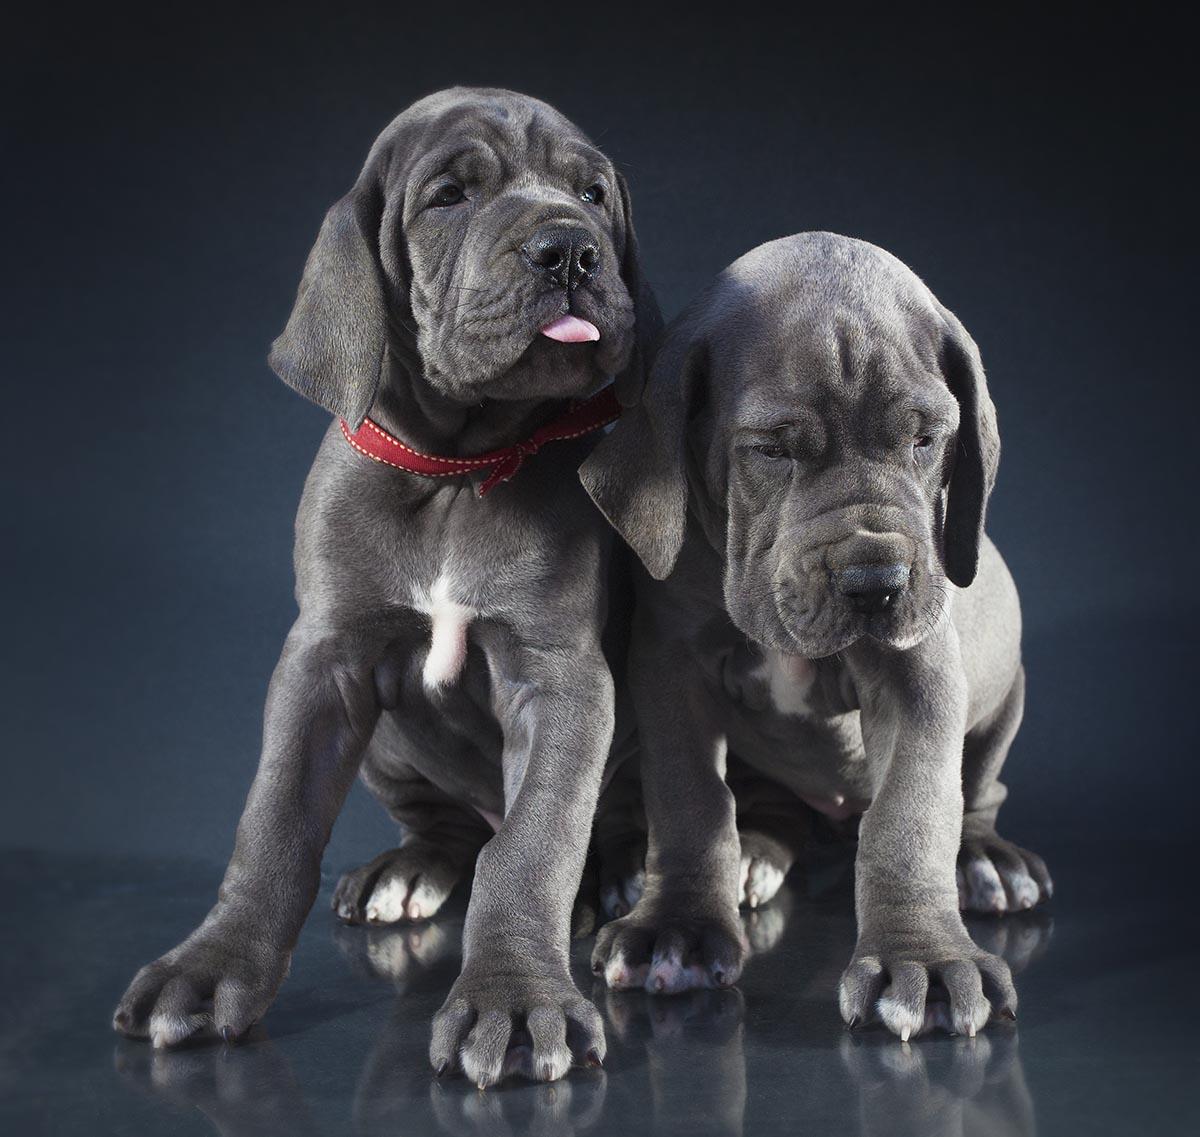 Maverick Danes, Guy J. Sagi, puppy sibling rivalry, Great Dane puppies, strobist photography